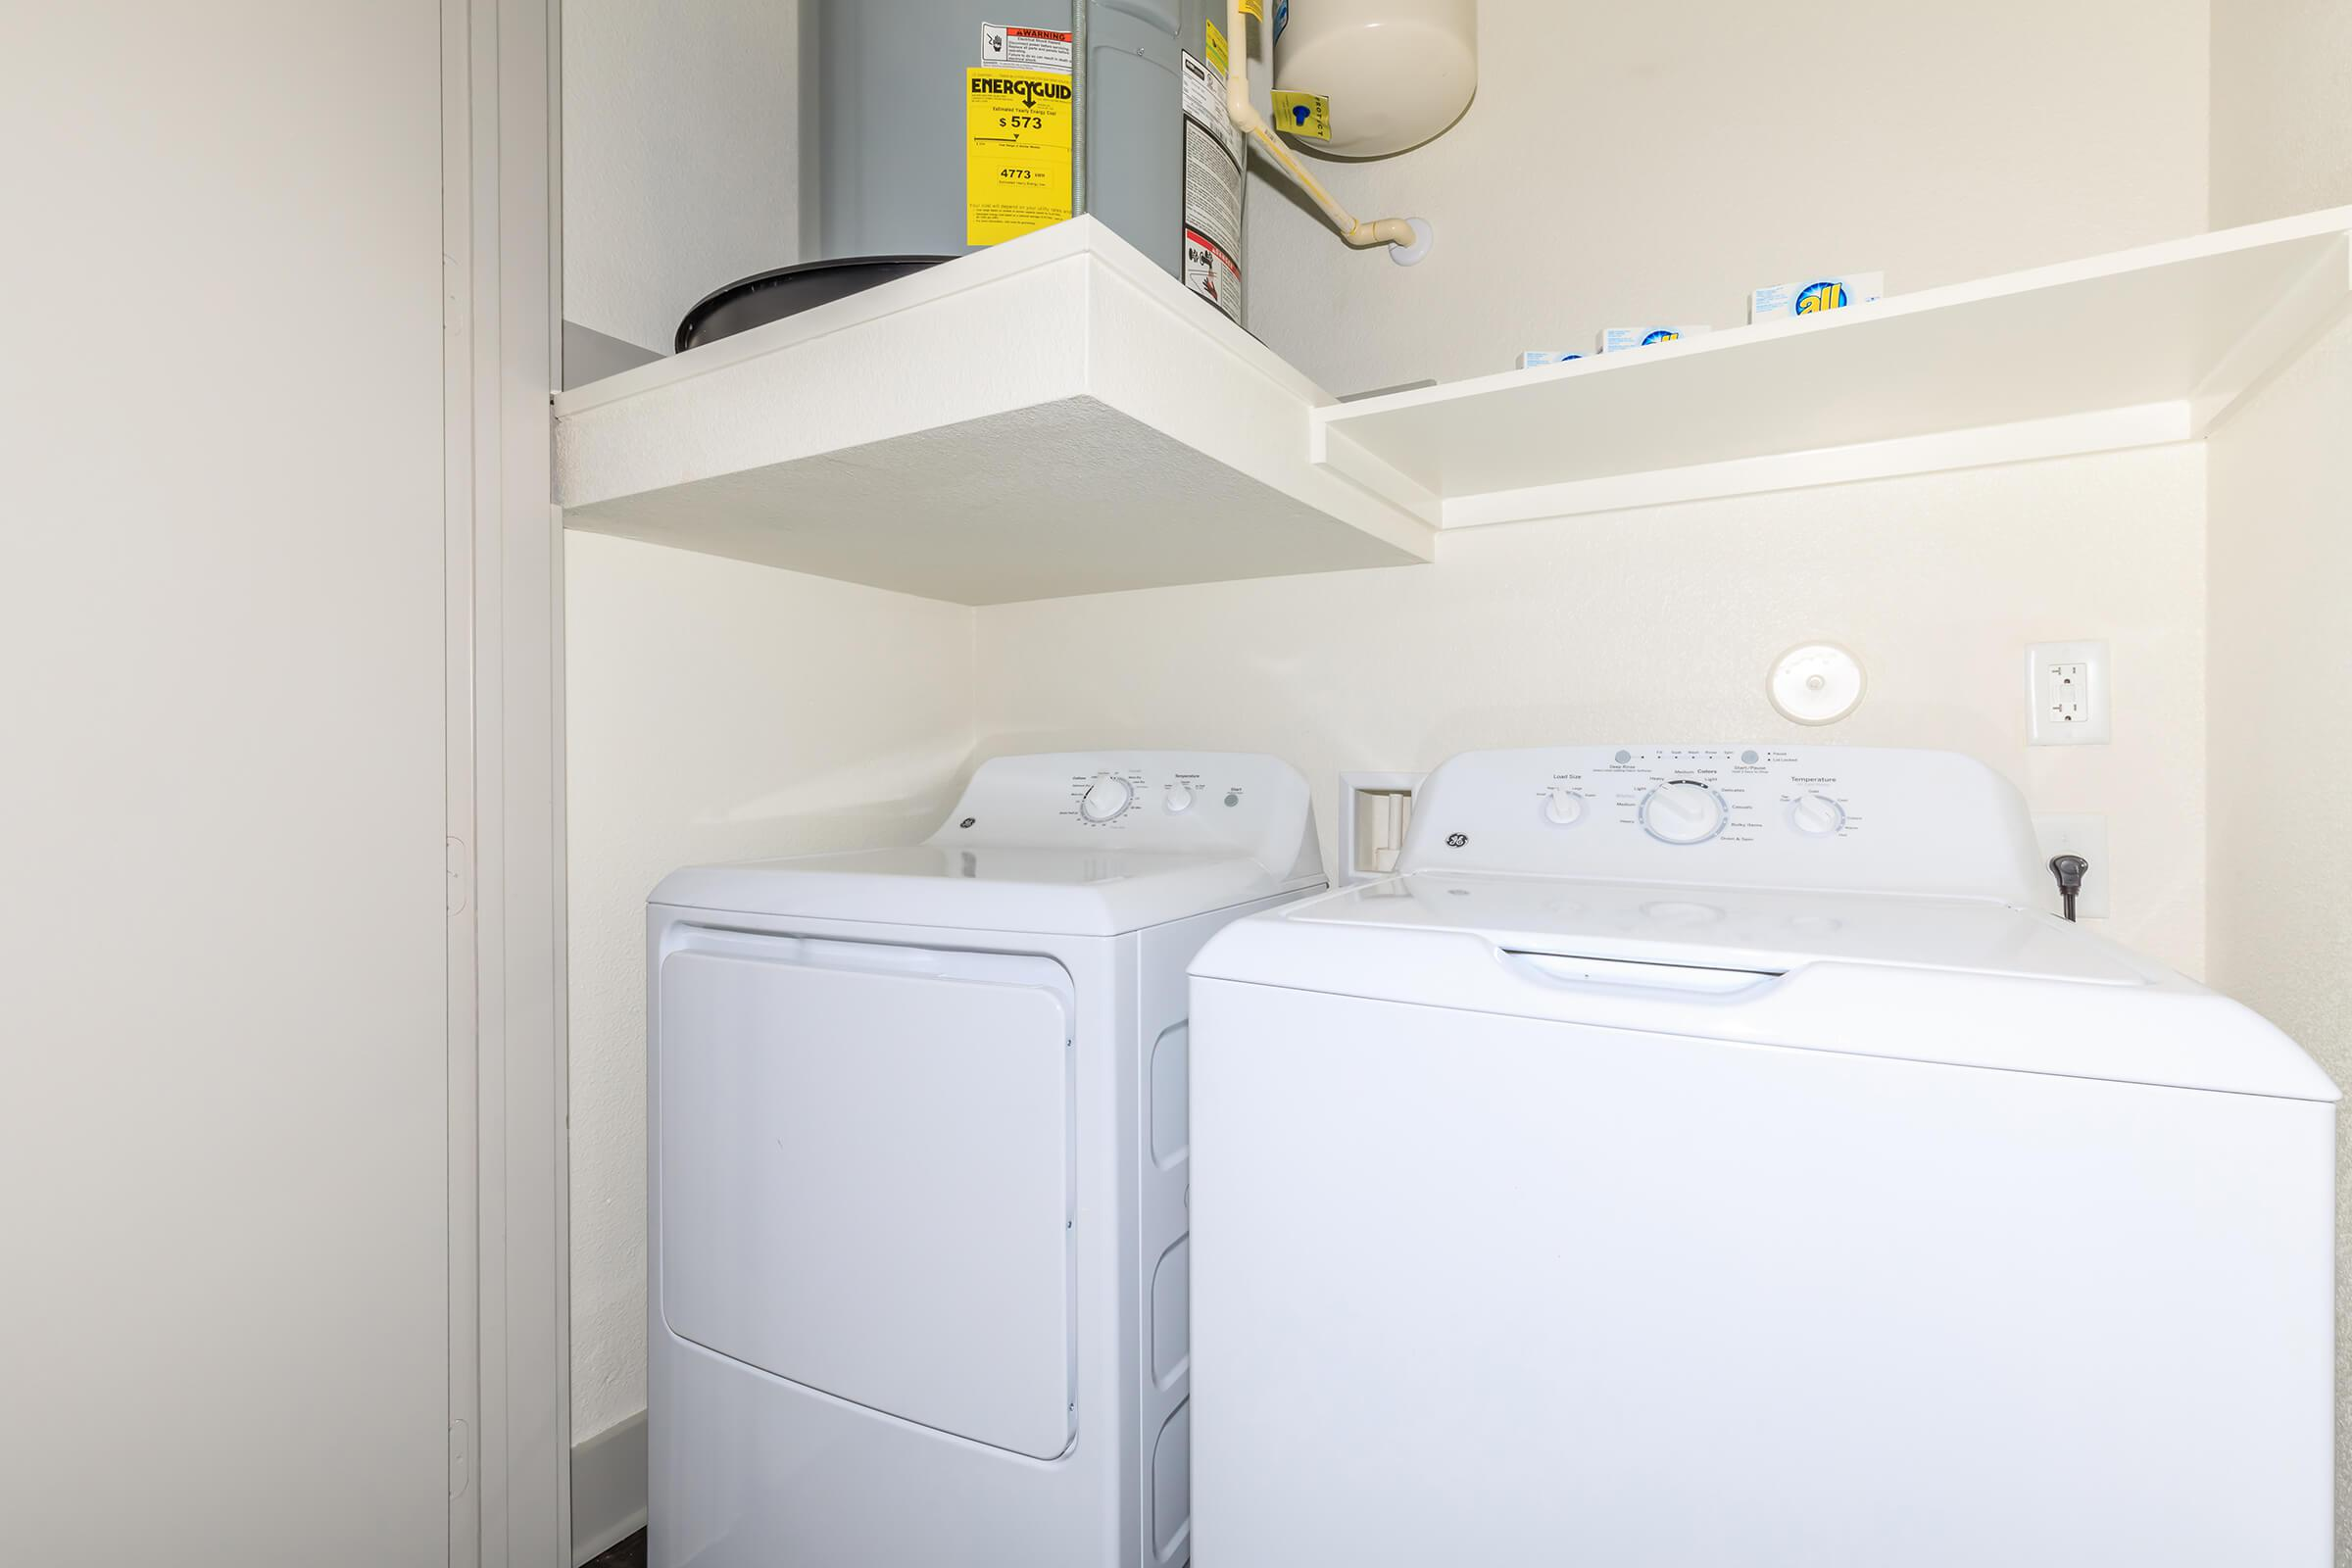 a white refrigerator freezer sitting inside of a box